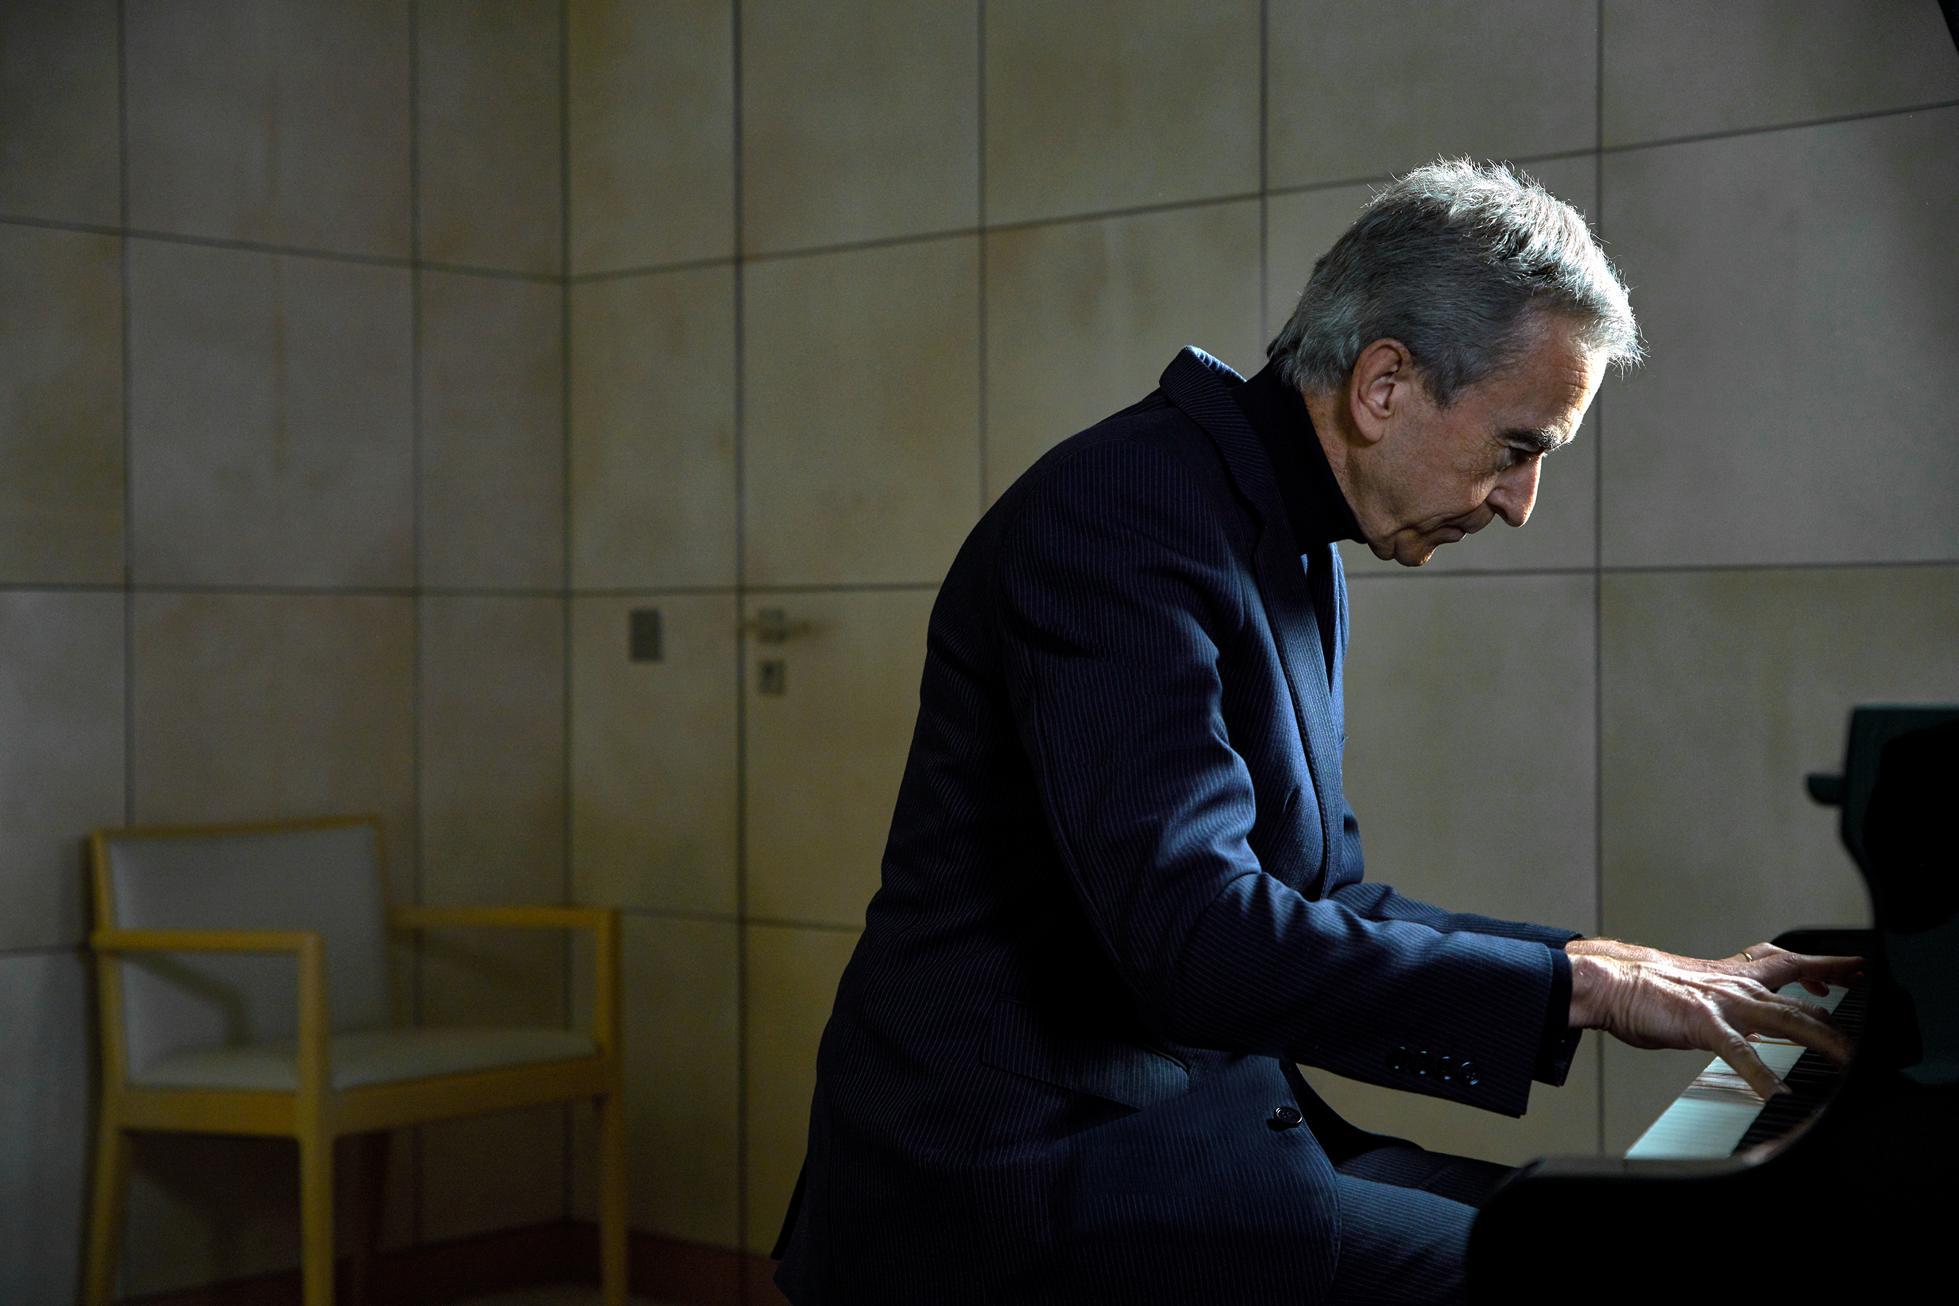 main-piano-Bernard-Arnault-by-Jamel-Toppin-34258_Ret